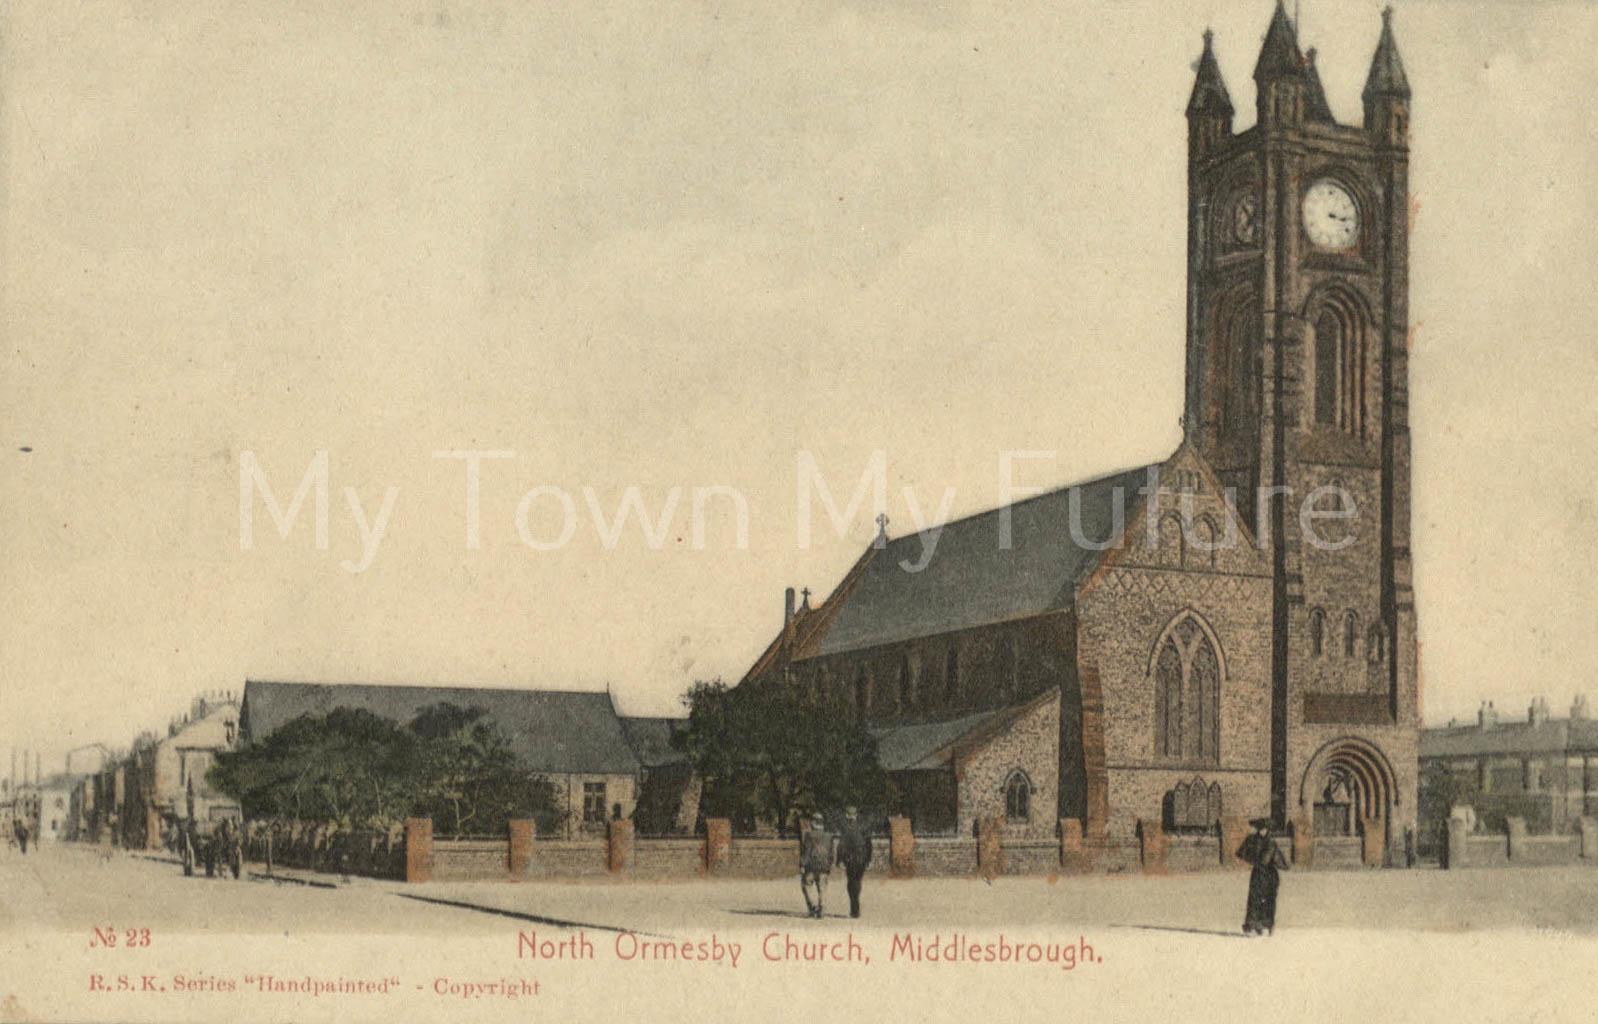 Holy Trinity Church, North Ormesby - RSK Series